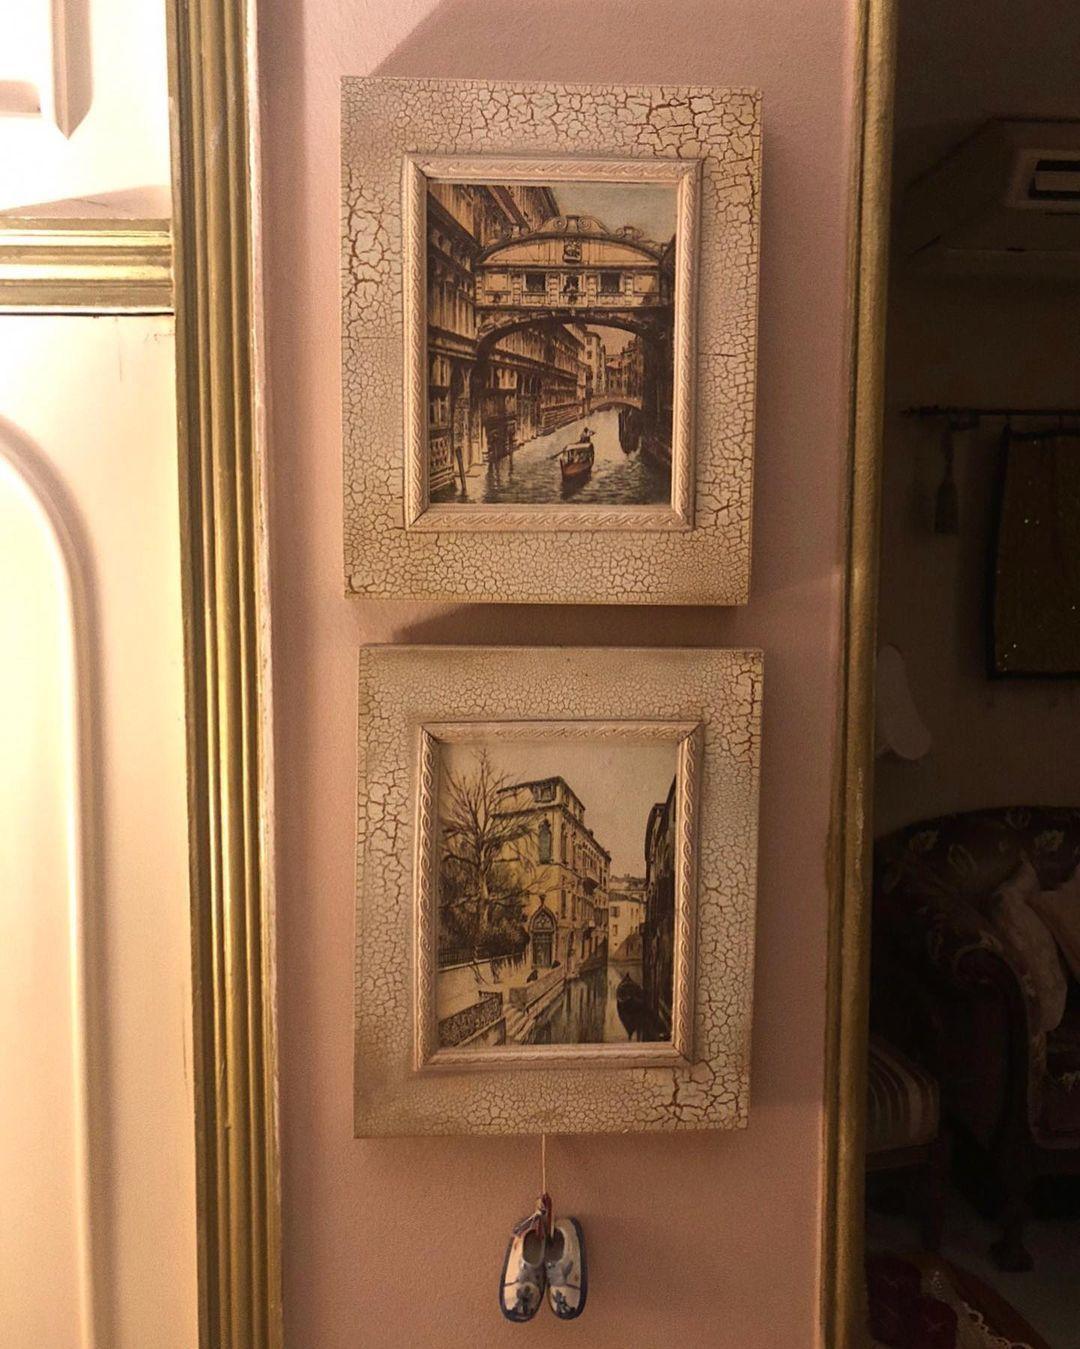 Tahani Ghanem On Instagram تابلوهات لاكيه معتق فيها رسومات للبندقية في ايطاليا بس جبتهم من جدة Jeddah Egypt Italy Venice Homedec Home Decor Decor Frame